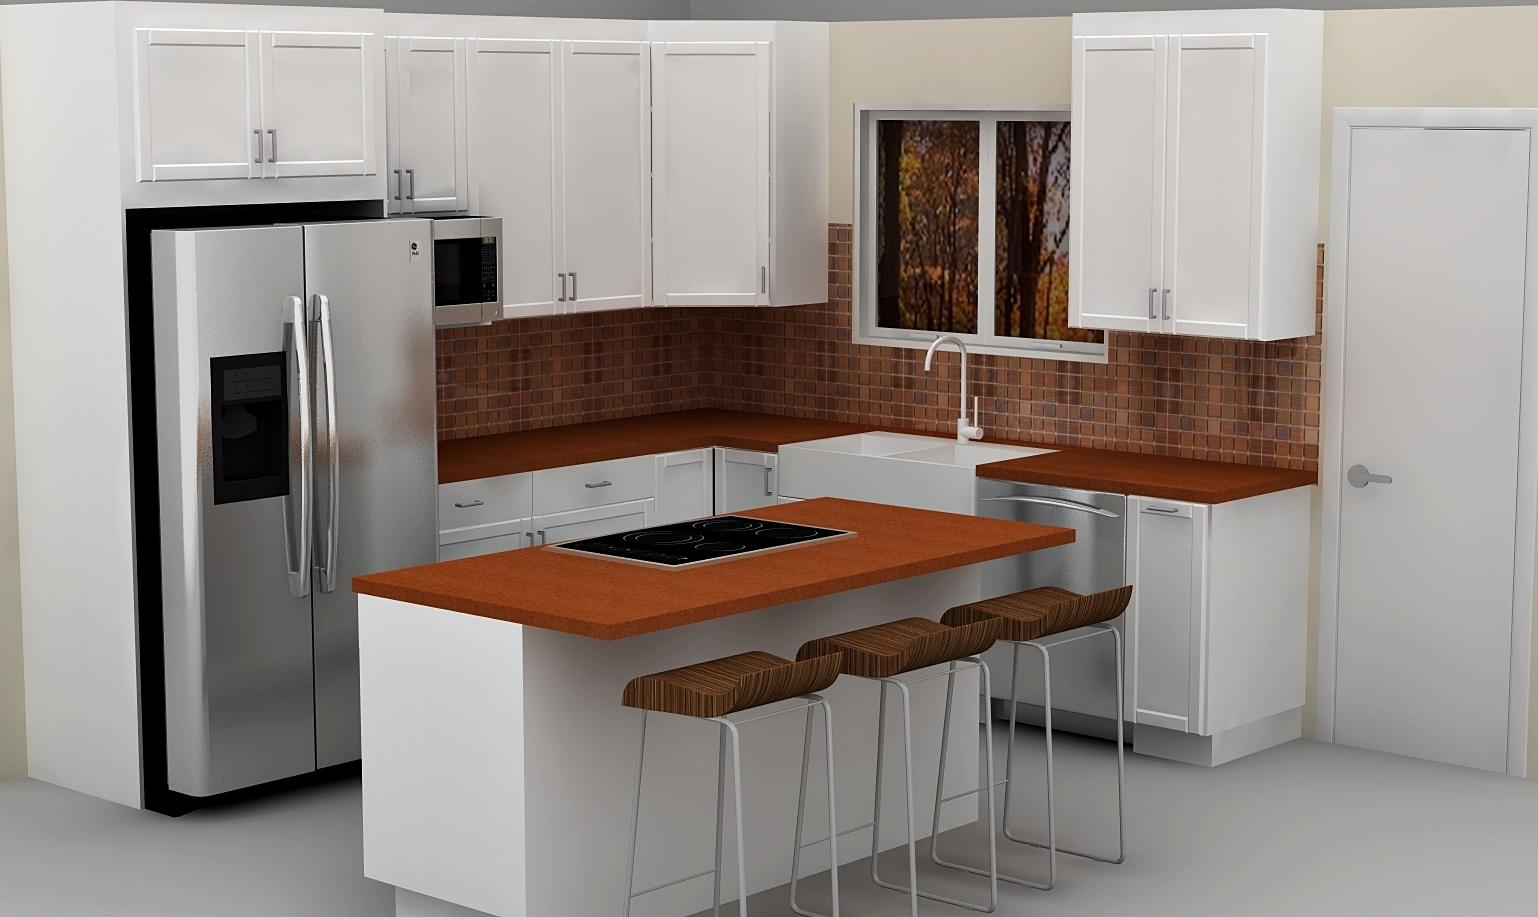 Design Gallery Ikea Dream Kitchens Islands Wood Ideas Small